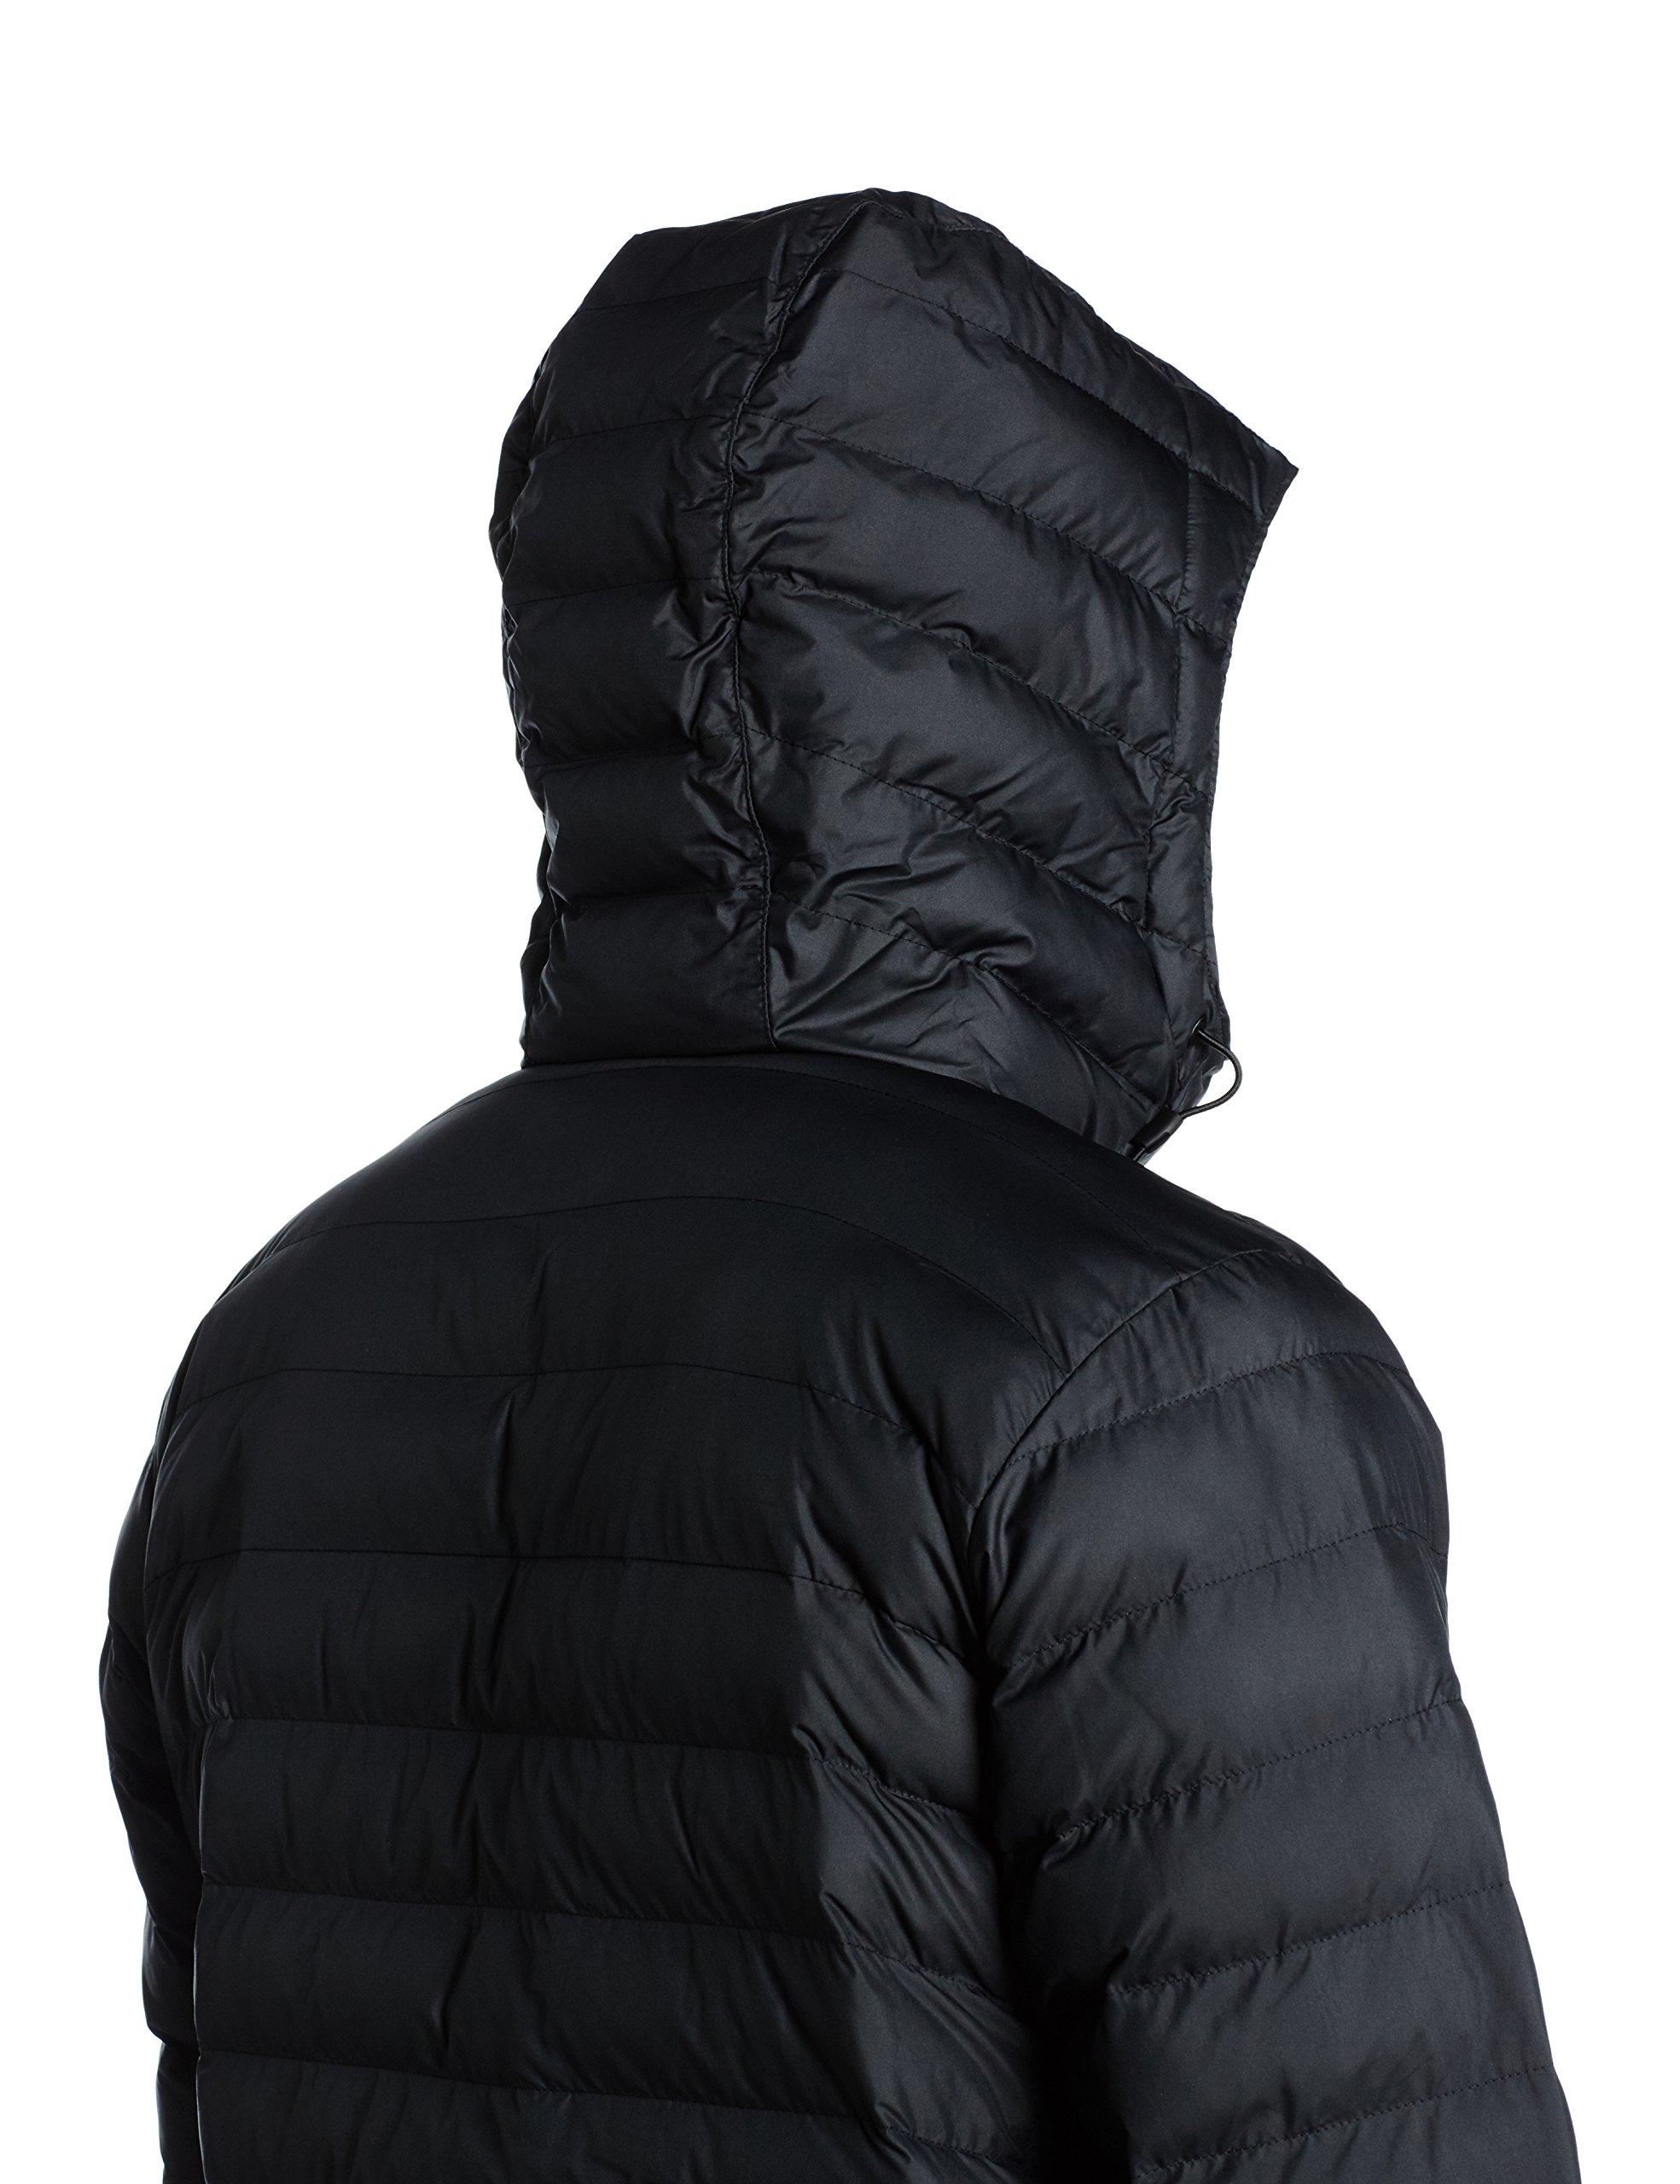 e4c42d487 Columbia WO1151 Insulated Jacket, Powder Lite Hooded Erkek Mont (Omni-Heat  Reflective)